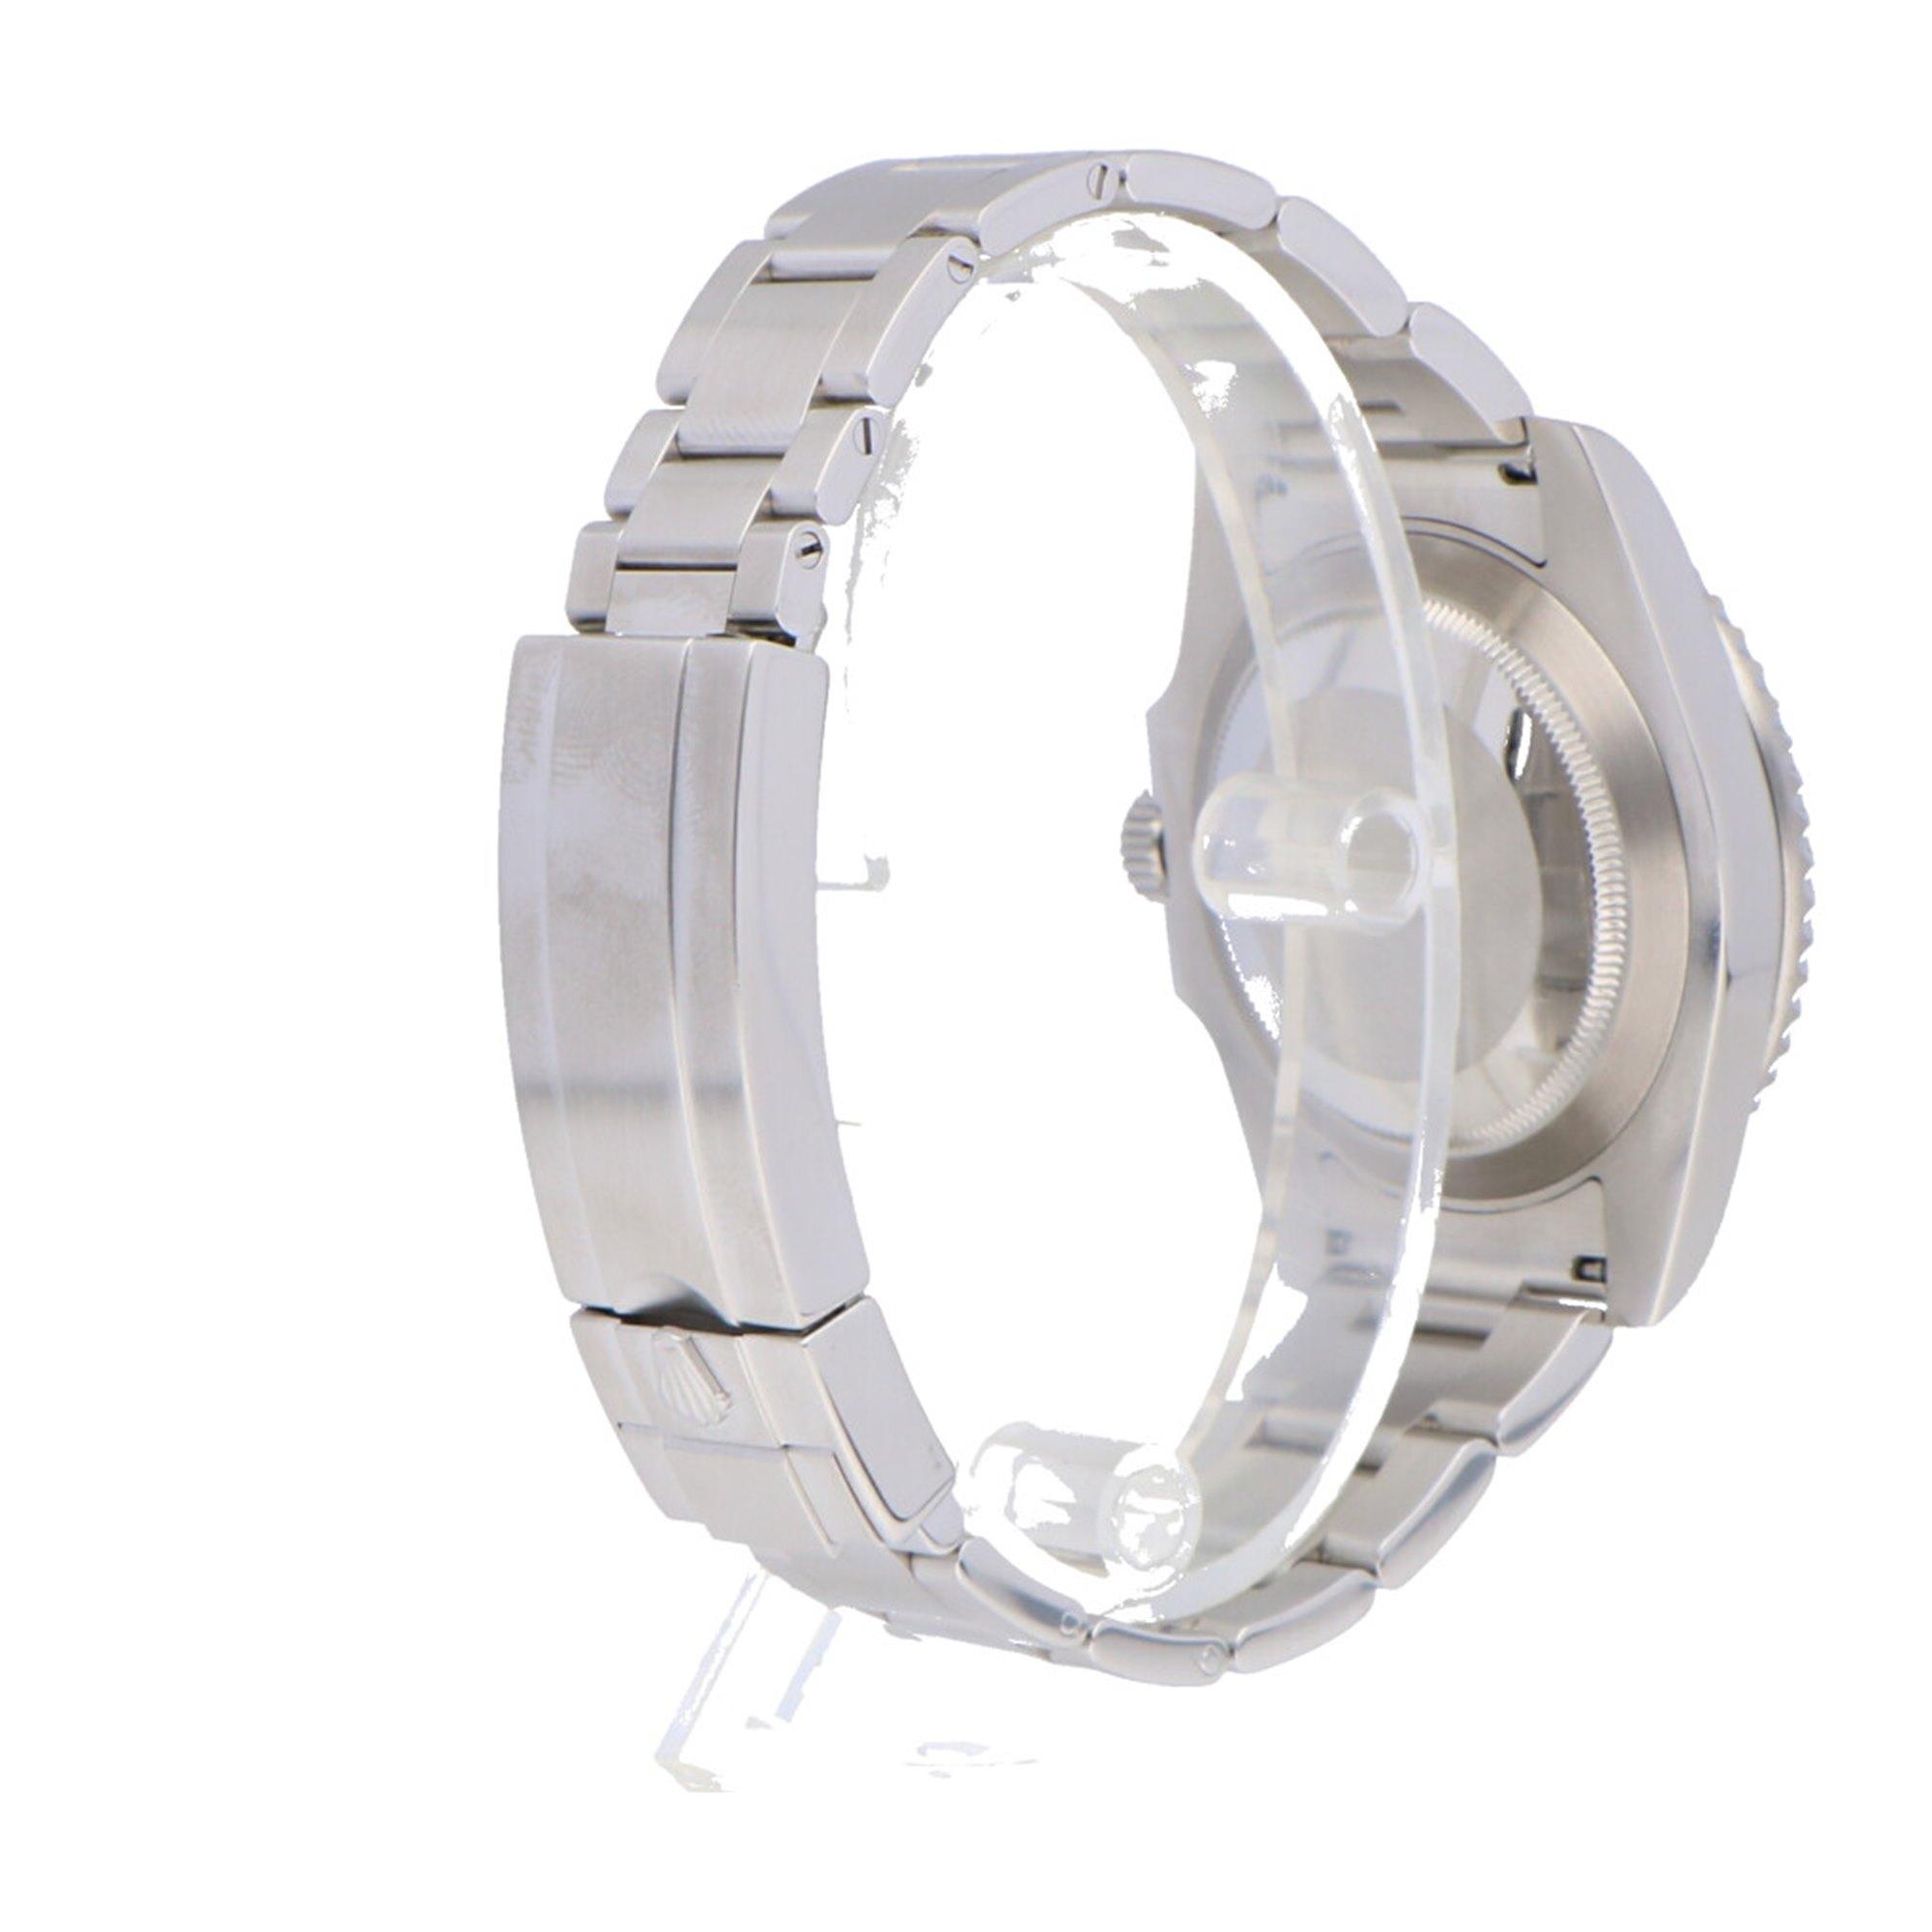 Rolex Submariner Date Stainless Steel 116610LV